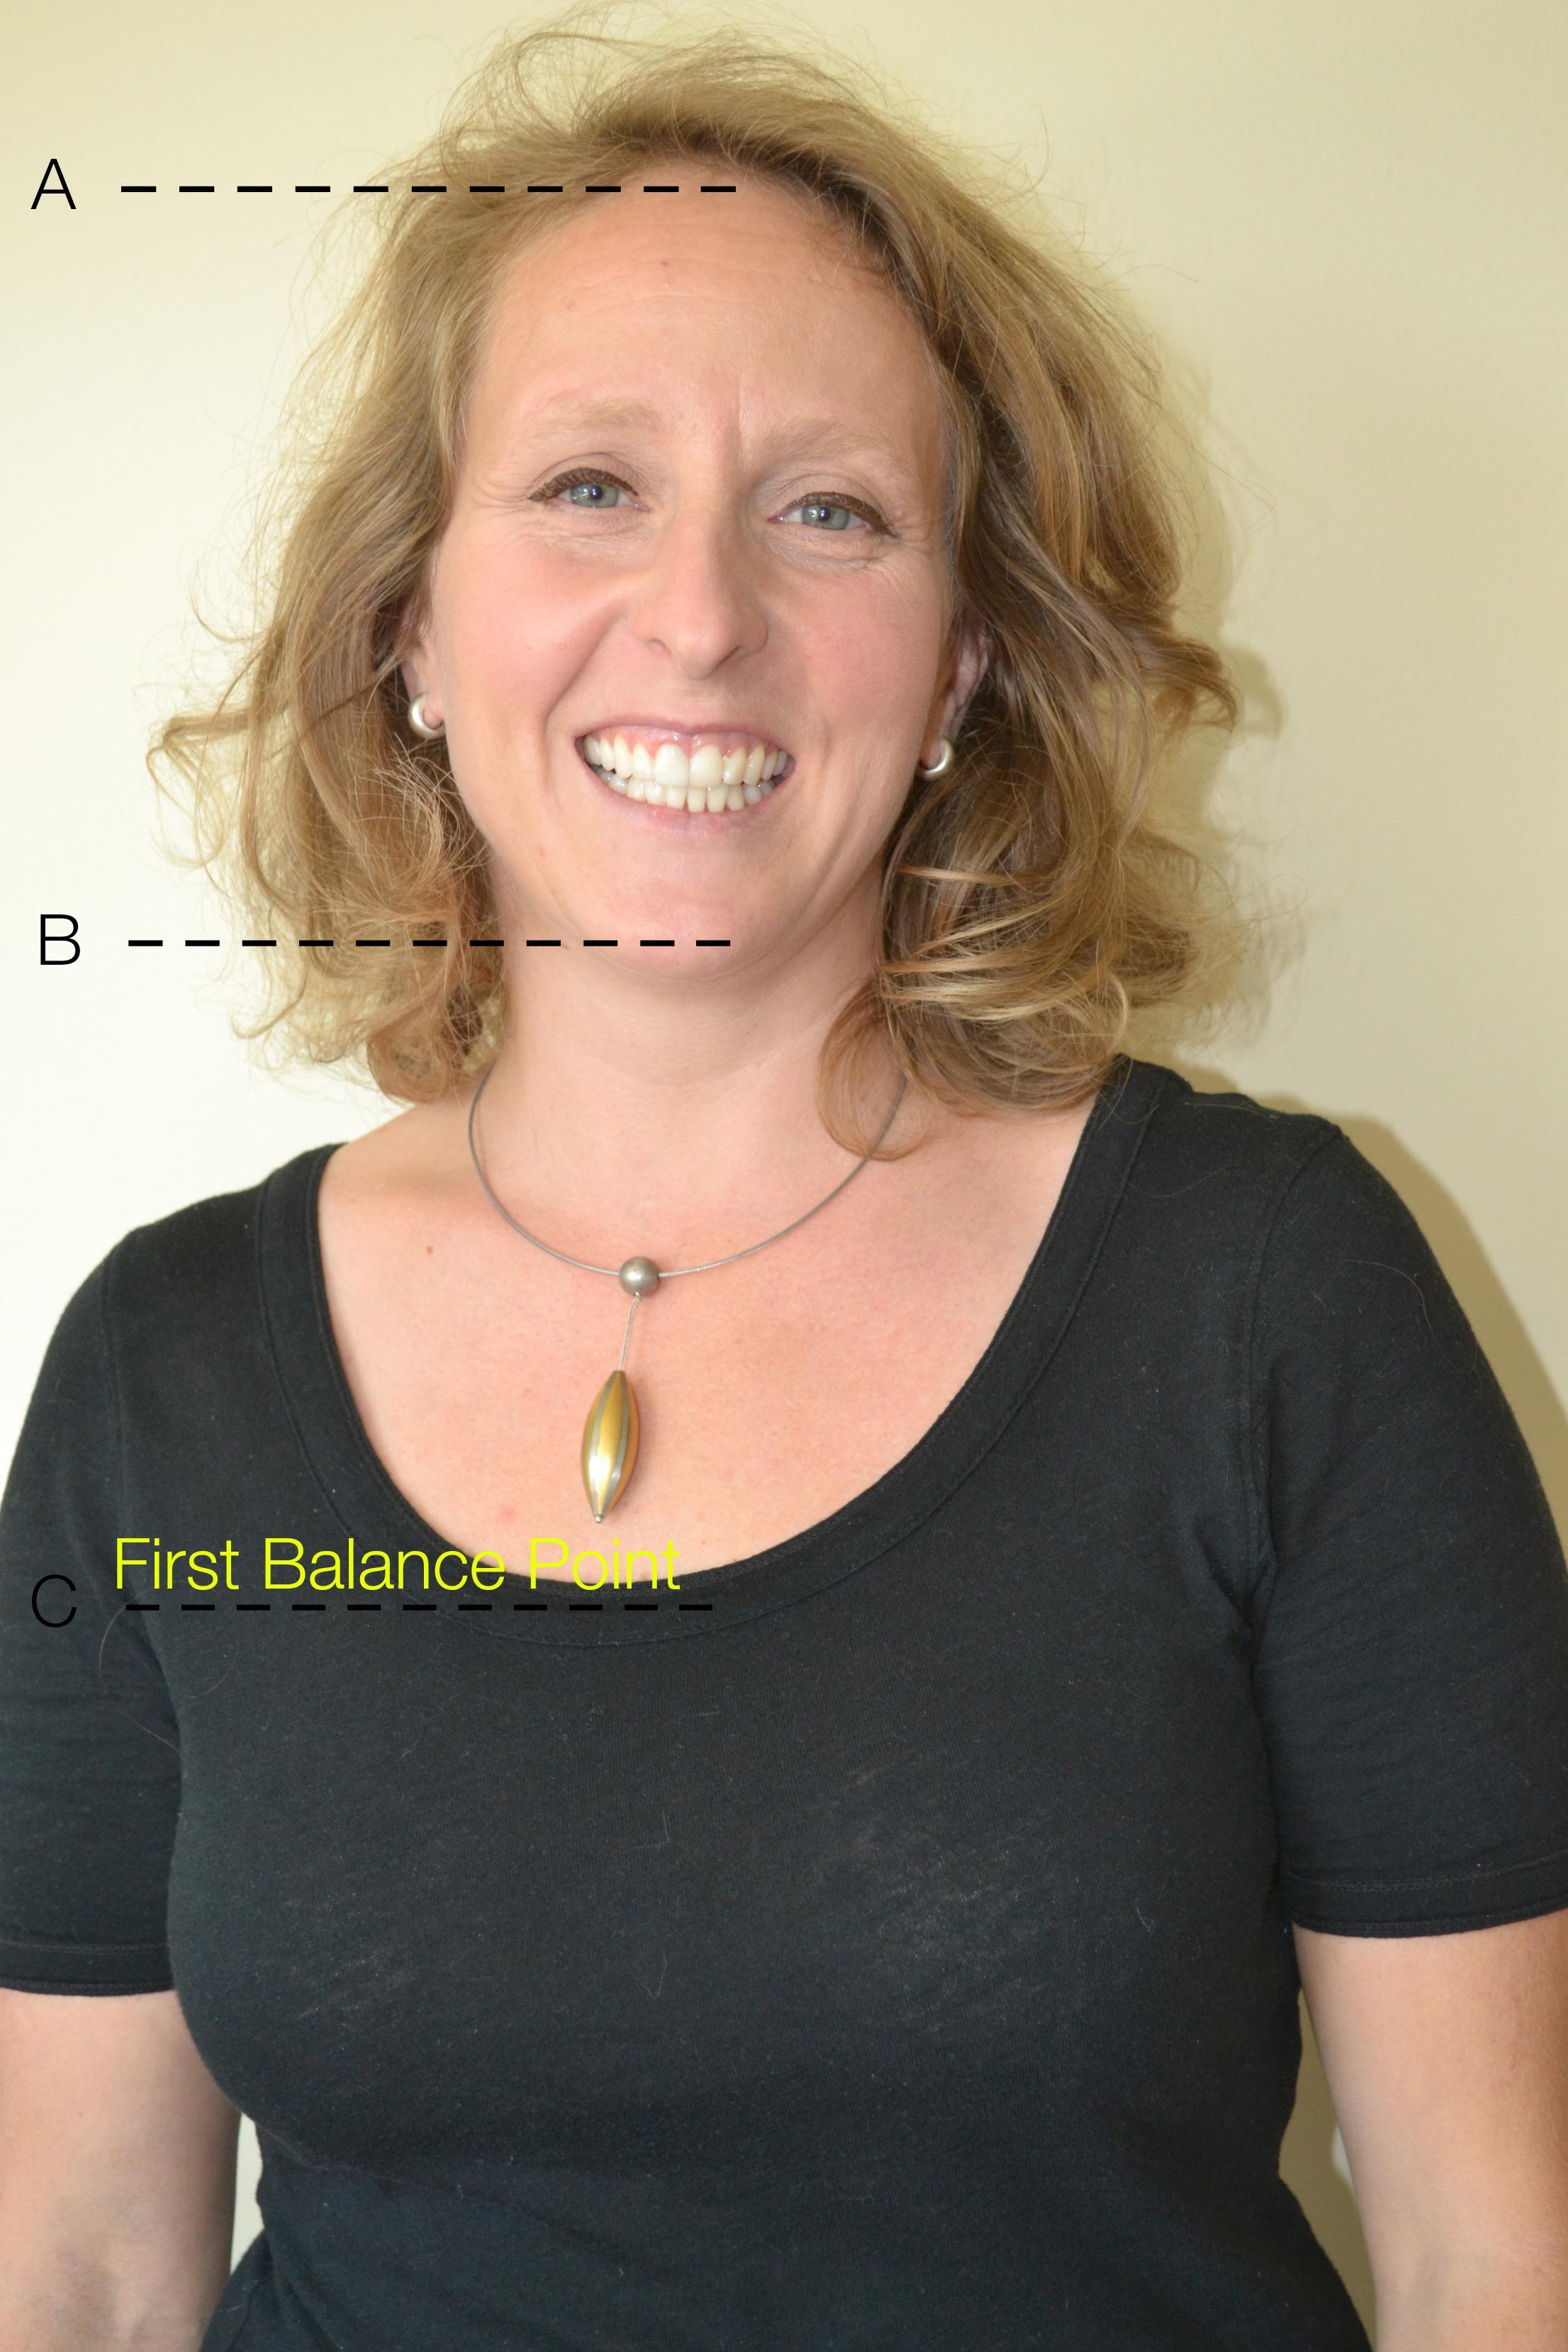 Marta_First Balance Point